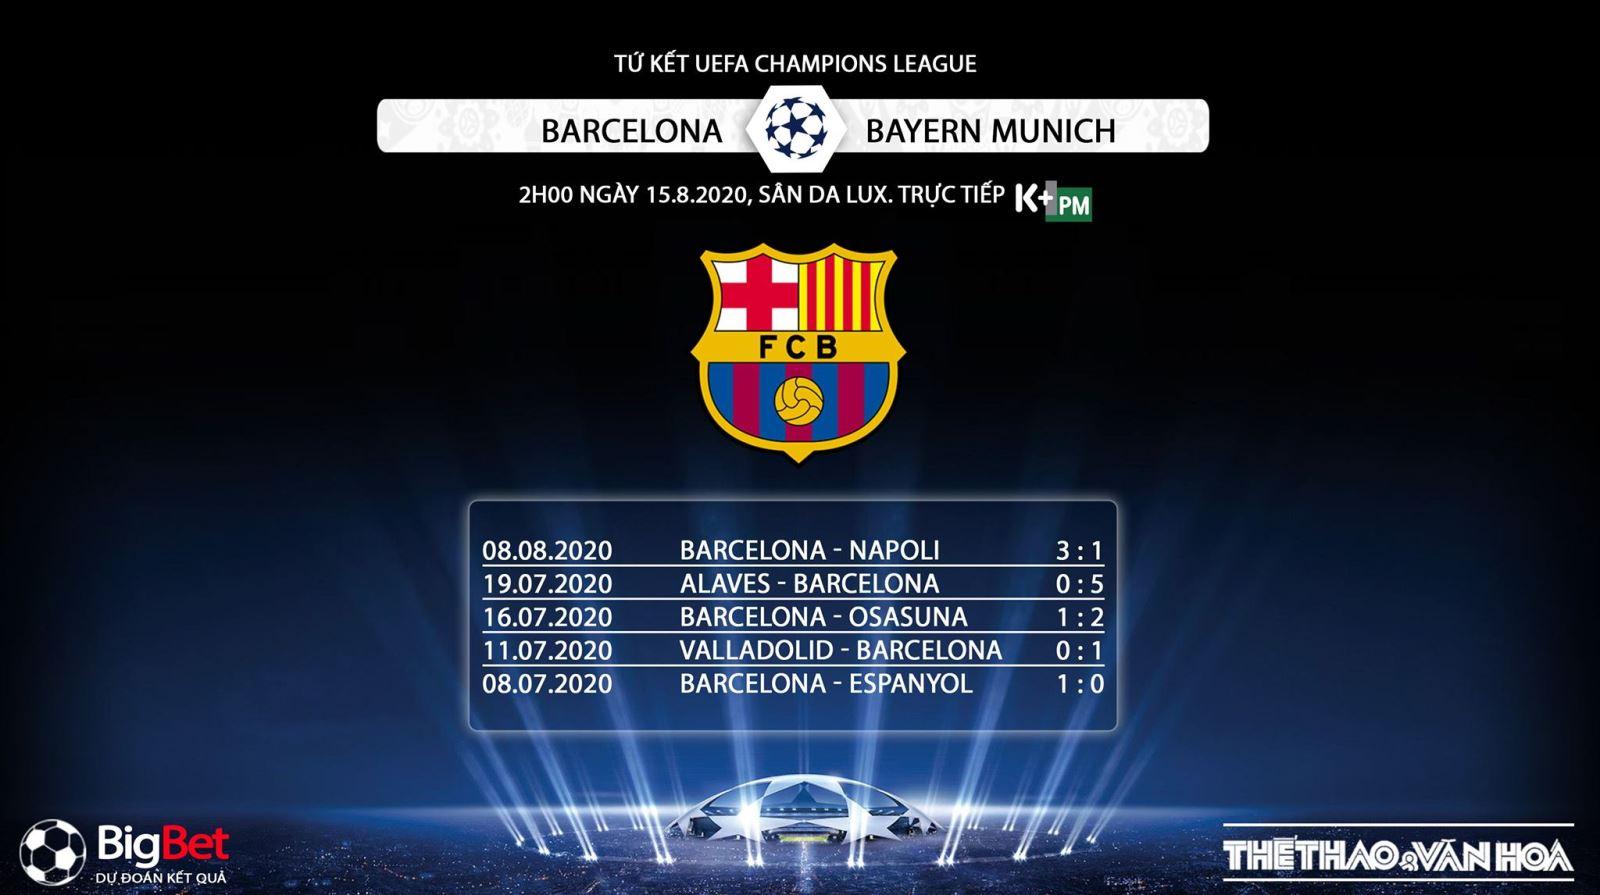 Barcelona vs Bayern Munich, soi kèo Barcelona vs Bayern Munich, nhận định Barcelona vs Bayern Munich, trực tiếp Barcelona vs Bayern Munich, bayern munich, barcelona